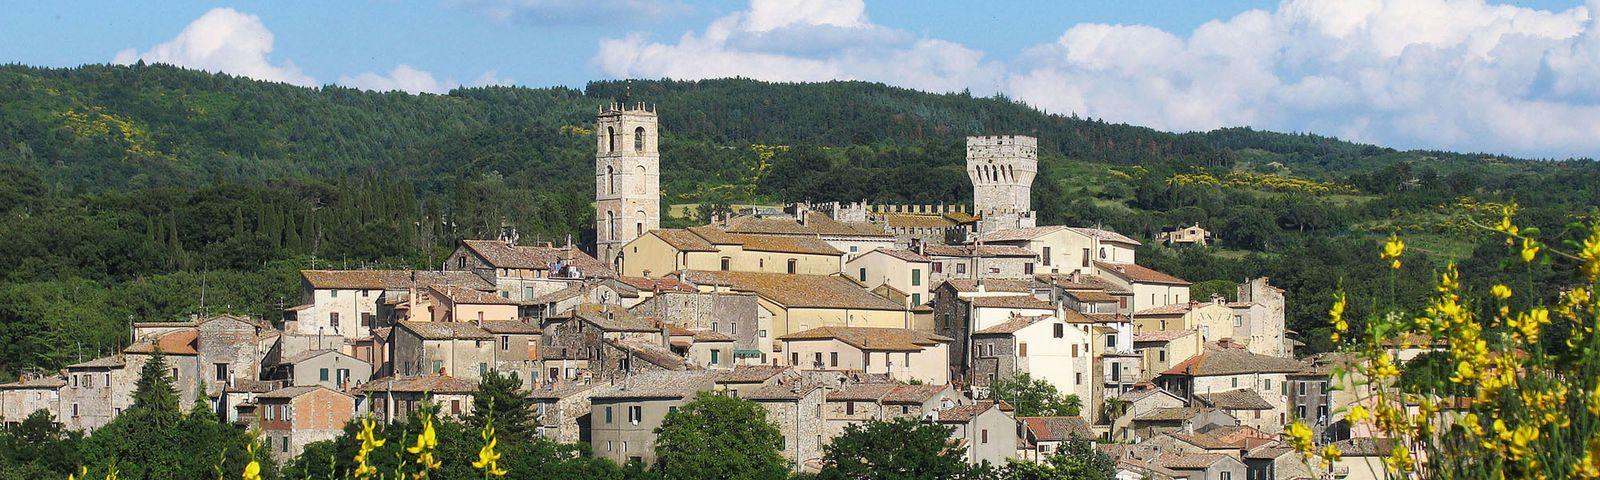 Tuscany holidays villas farmhouses spa food and wine in tuscany san casciano dei bagni - Terme san casciano dei bagni ...